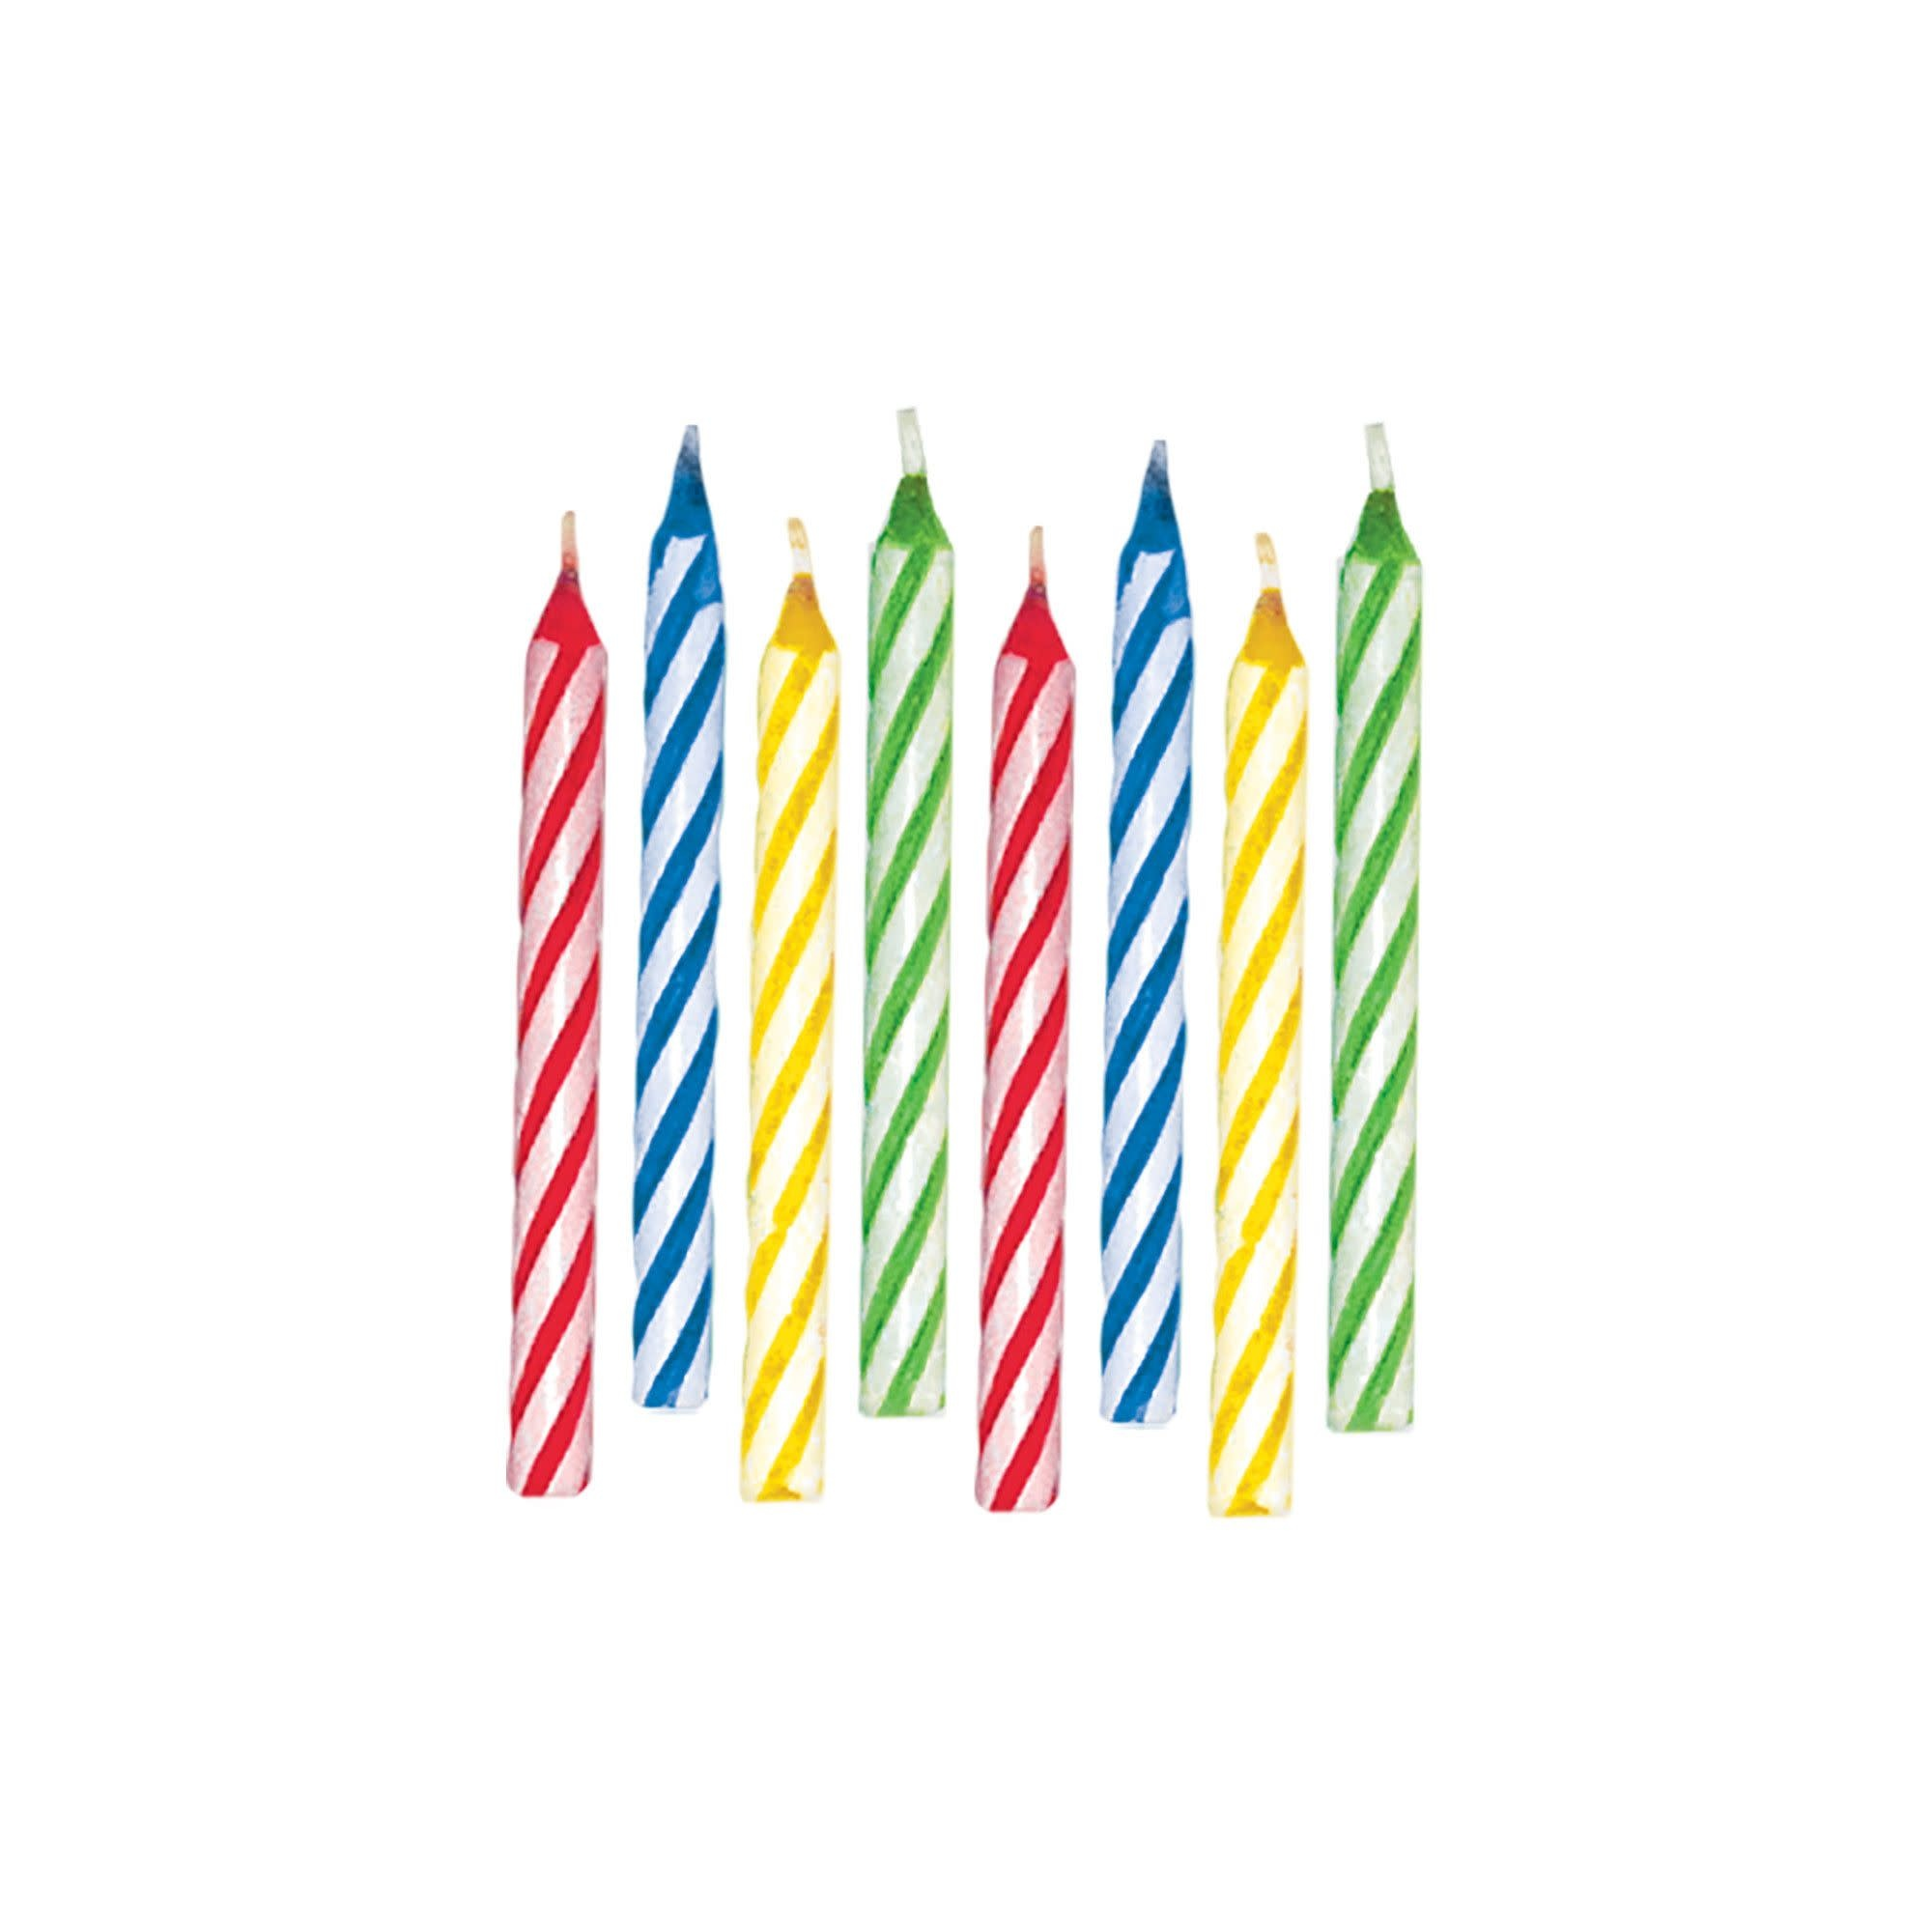 Magic Re-Light Birthday Candles